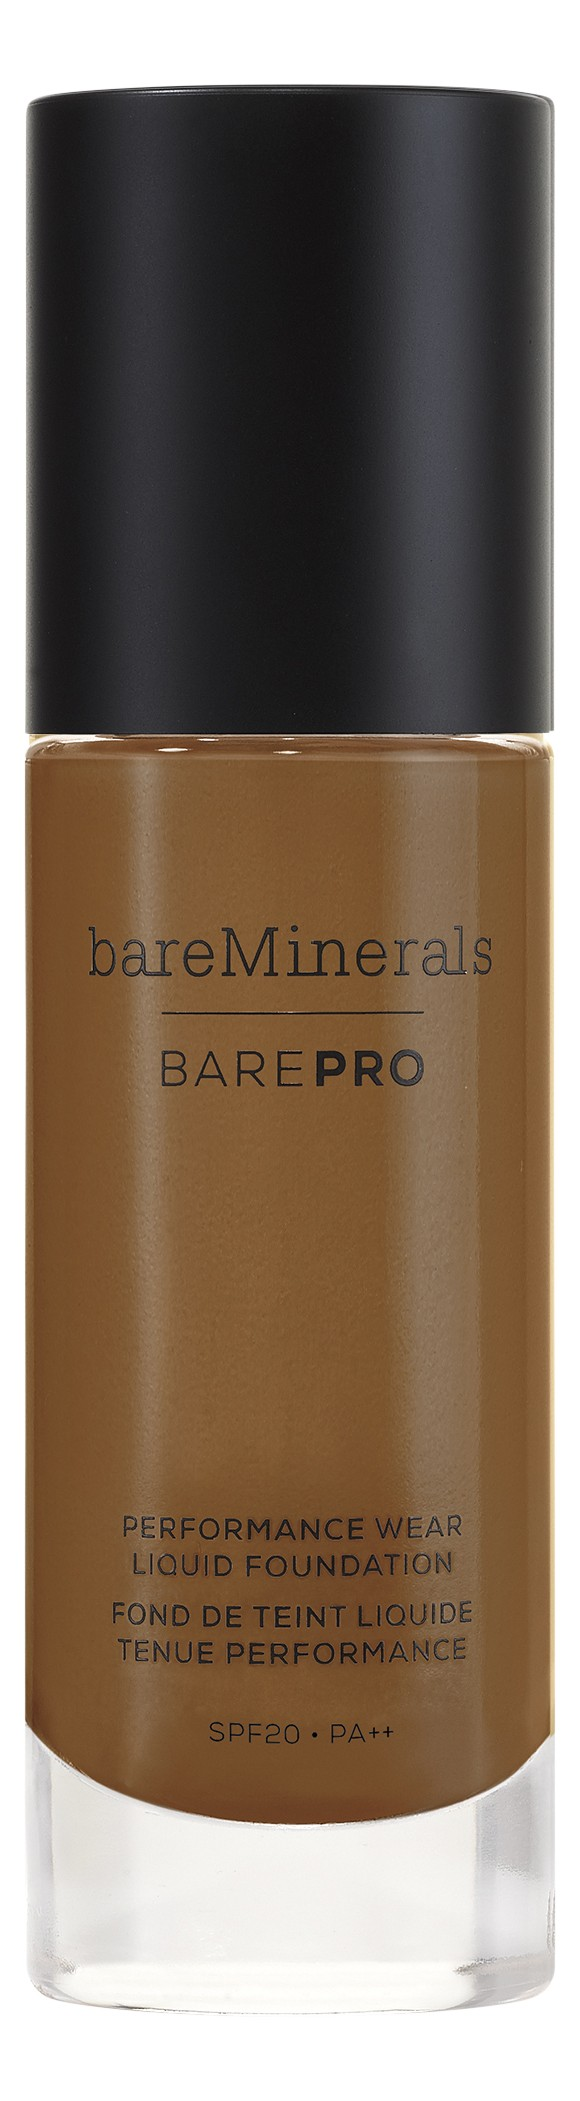 bareMinerals - Barepro Performance Wear Liquid Foundation - Cocoa 30